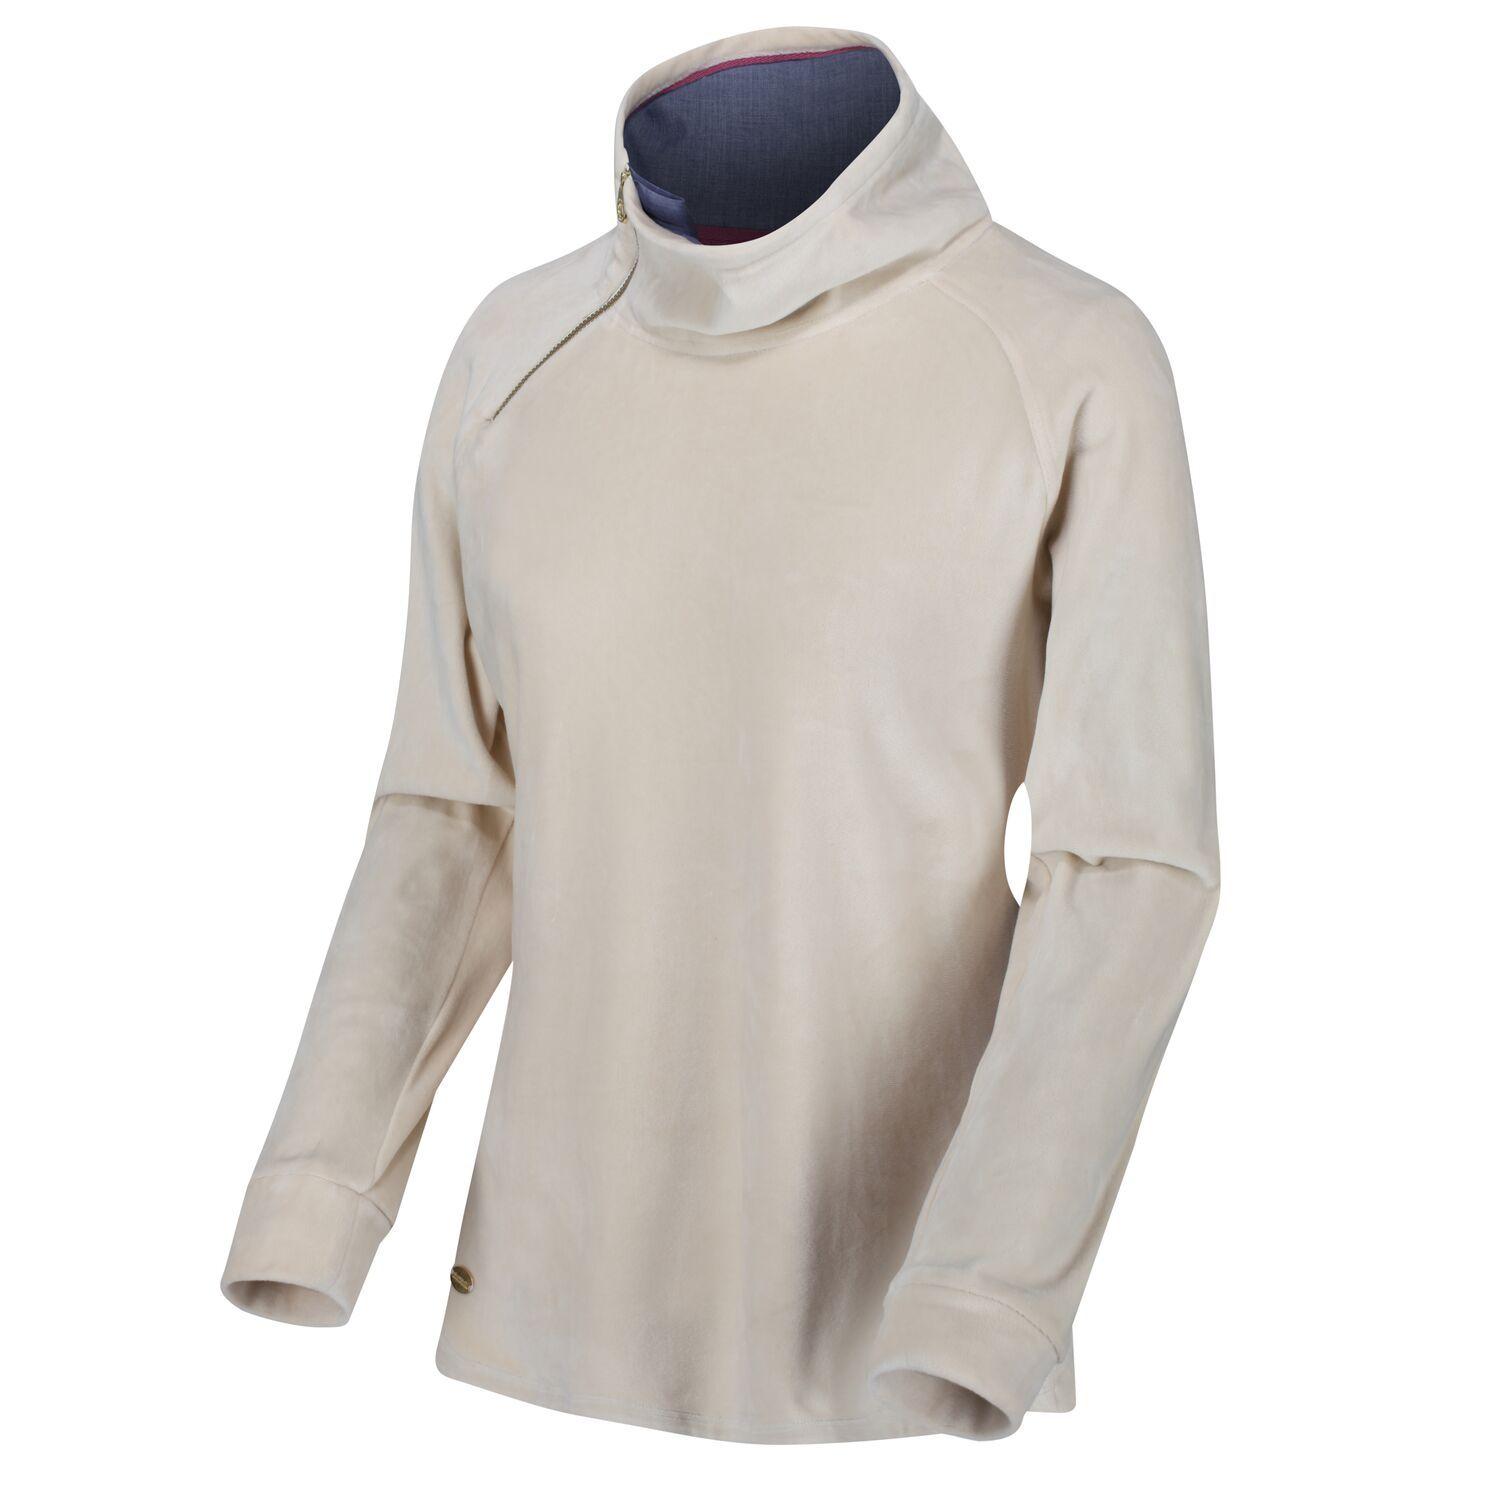 Regatta Womens/Ladies Cilona Velour Sweatshirt